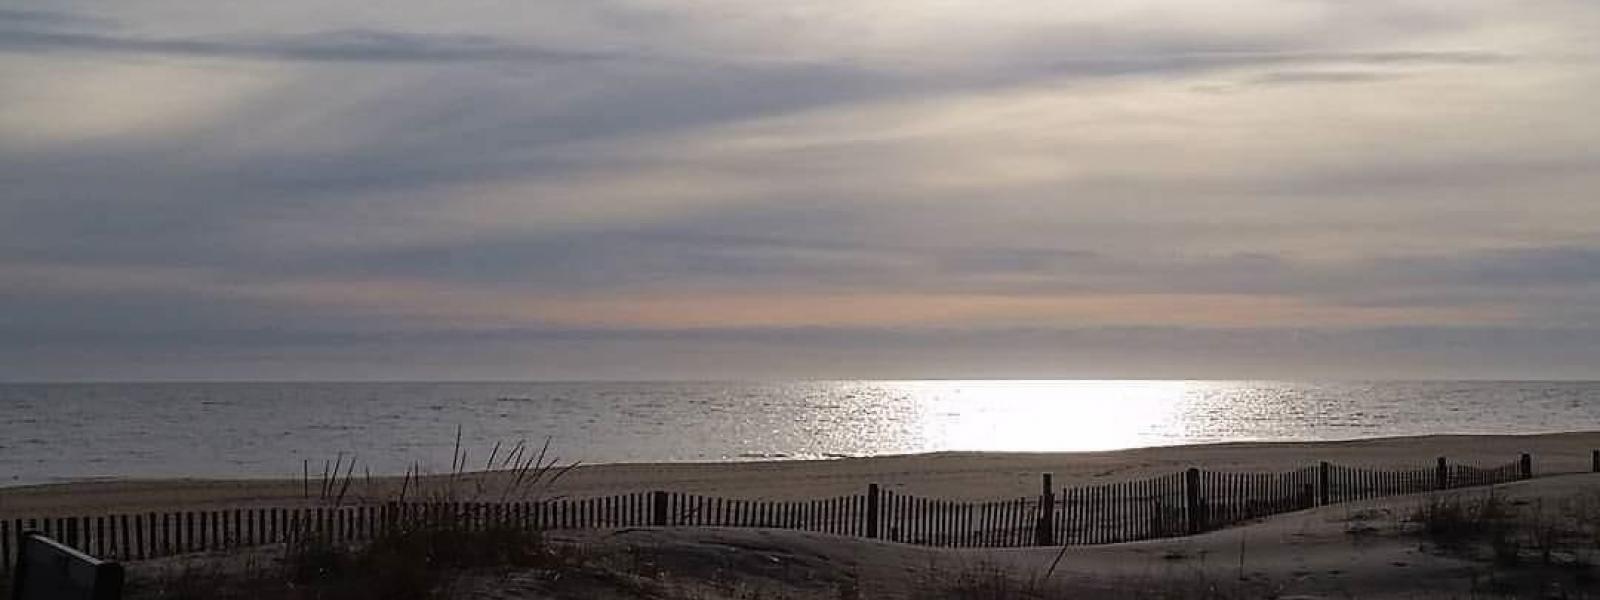 The sun setting on Middlesex Beach